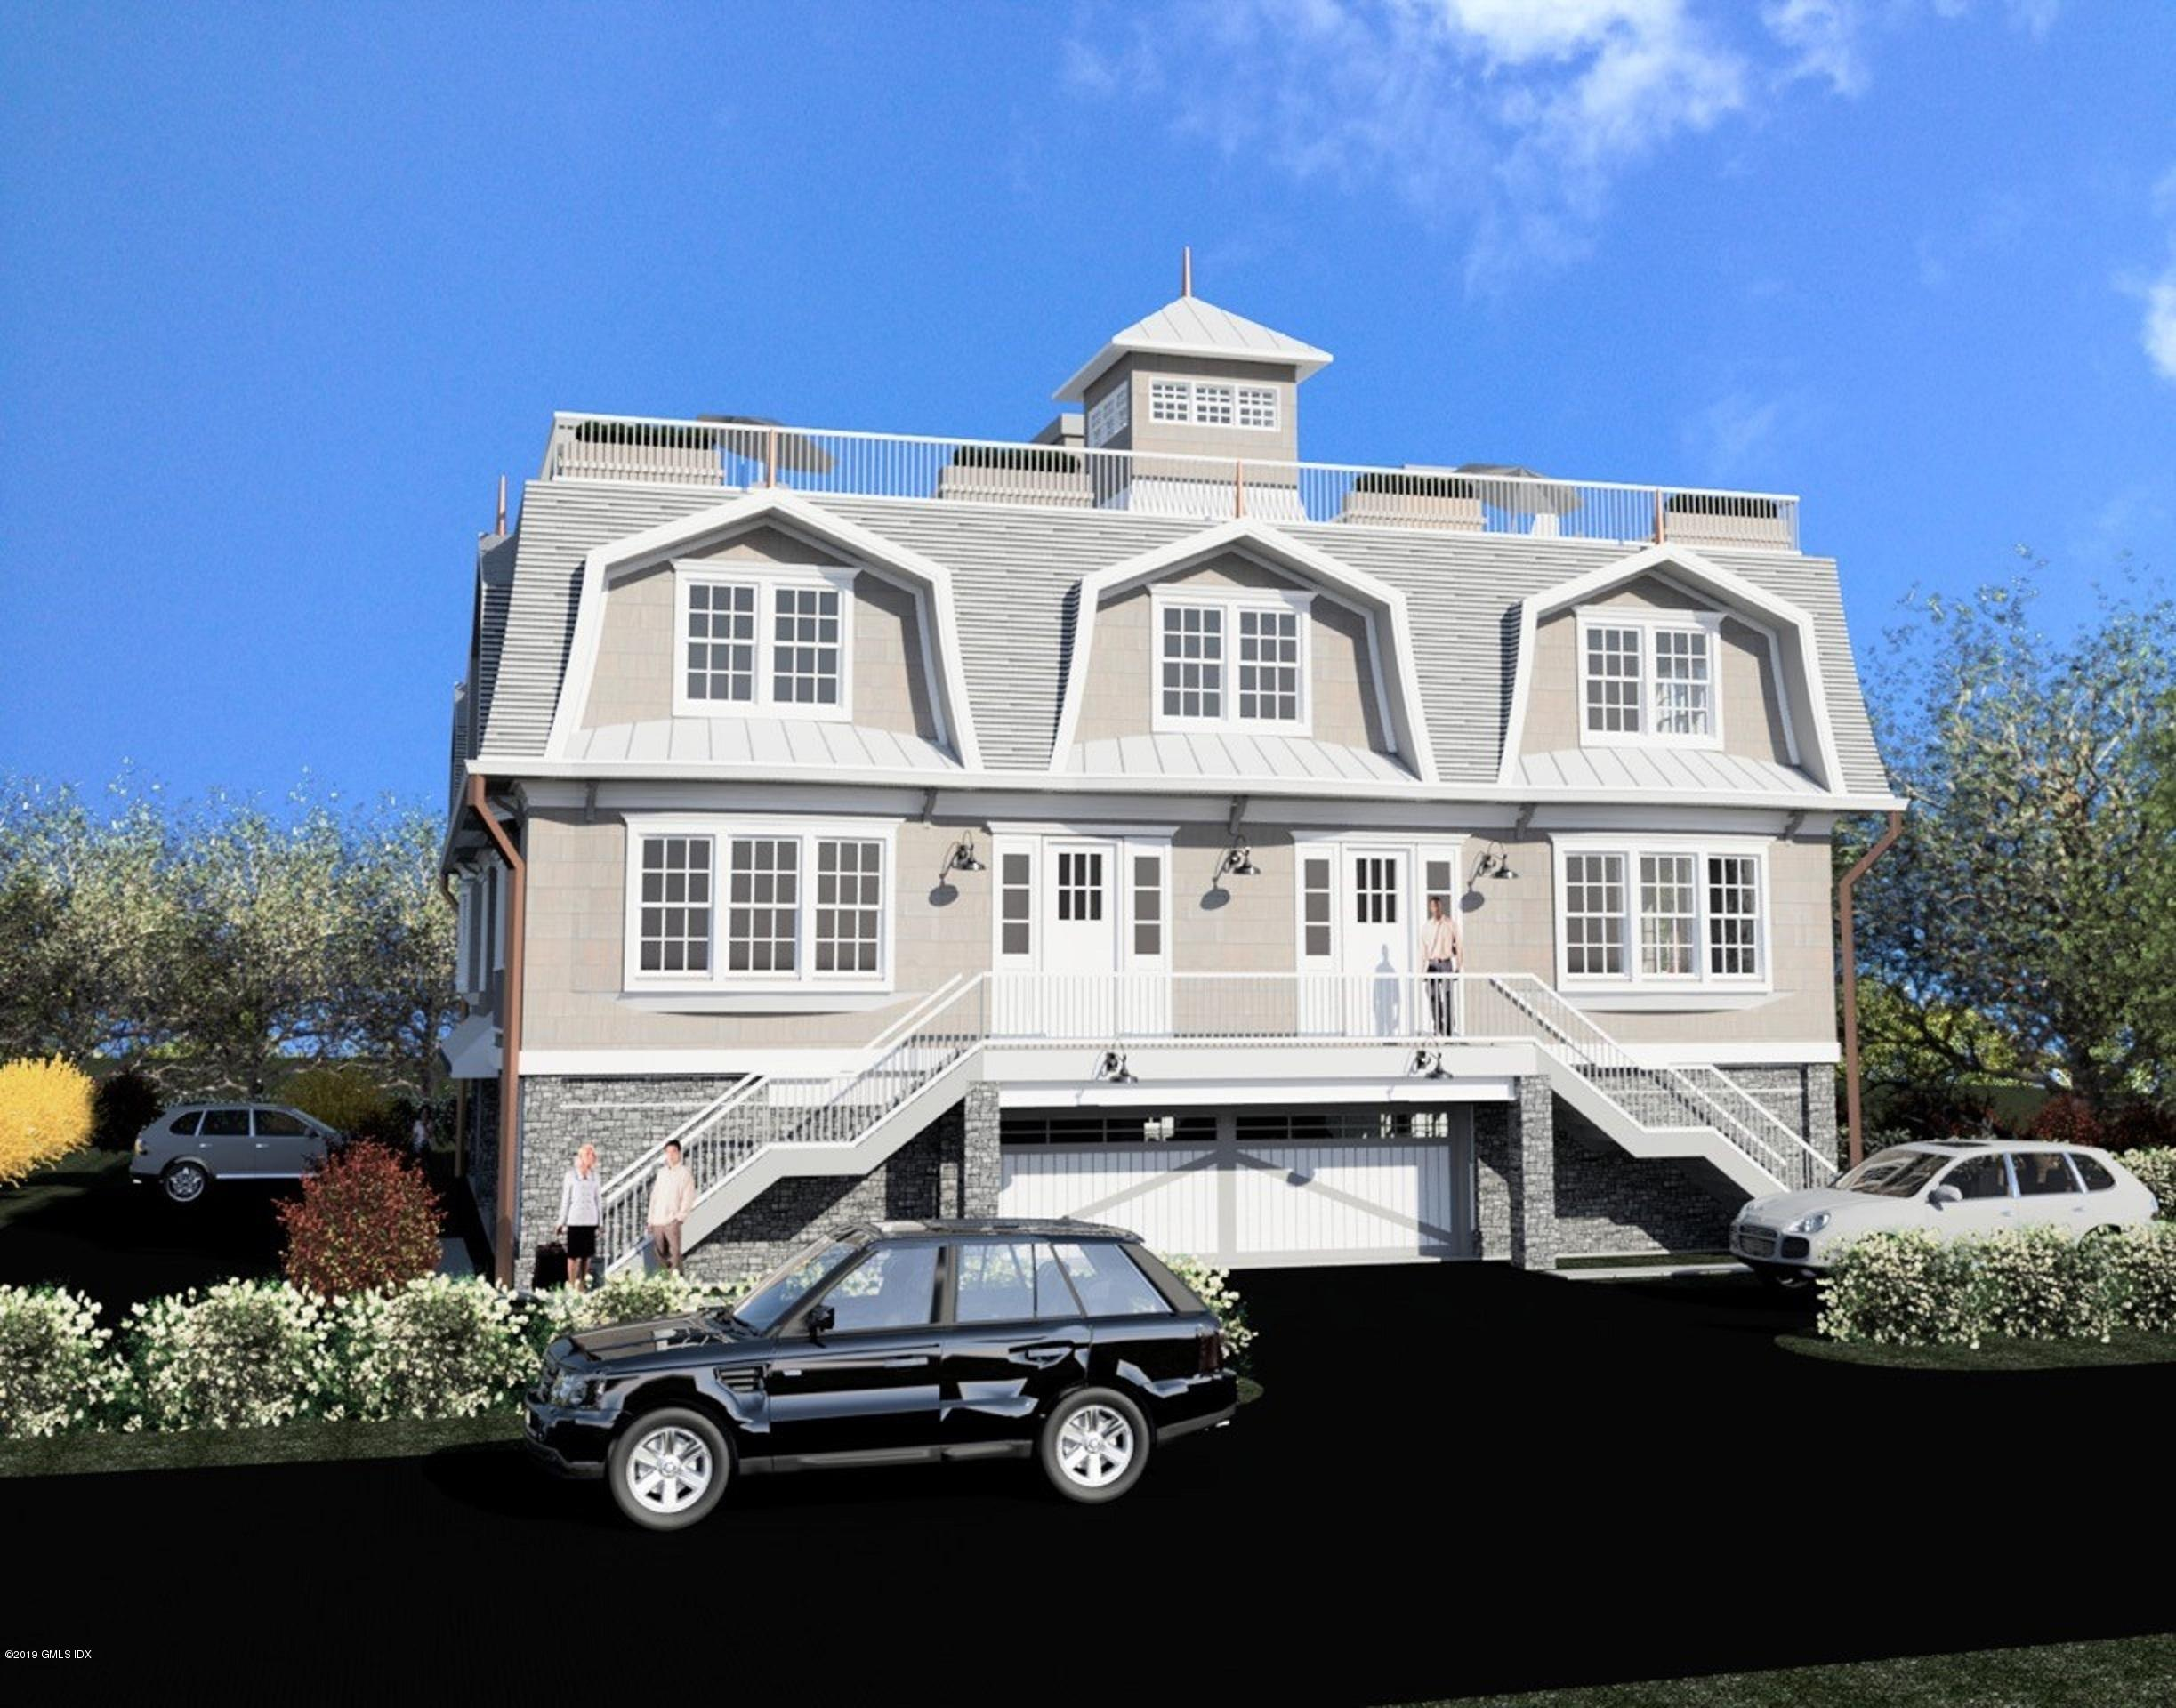 20 Idar Court,Greenwich,Connecticut 06830,3 Bedrooms Bedrooms,3 BathroomsBathrooms,Condominium,Idar,107867